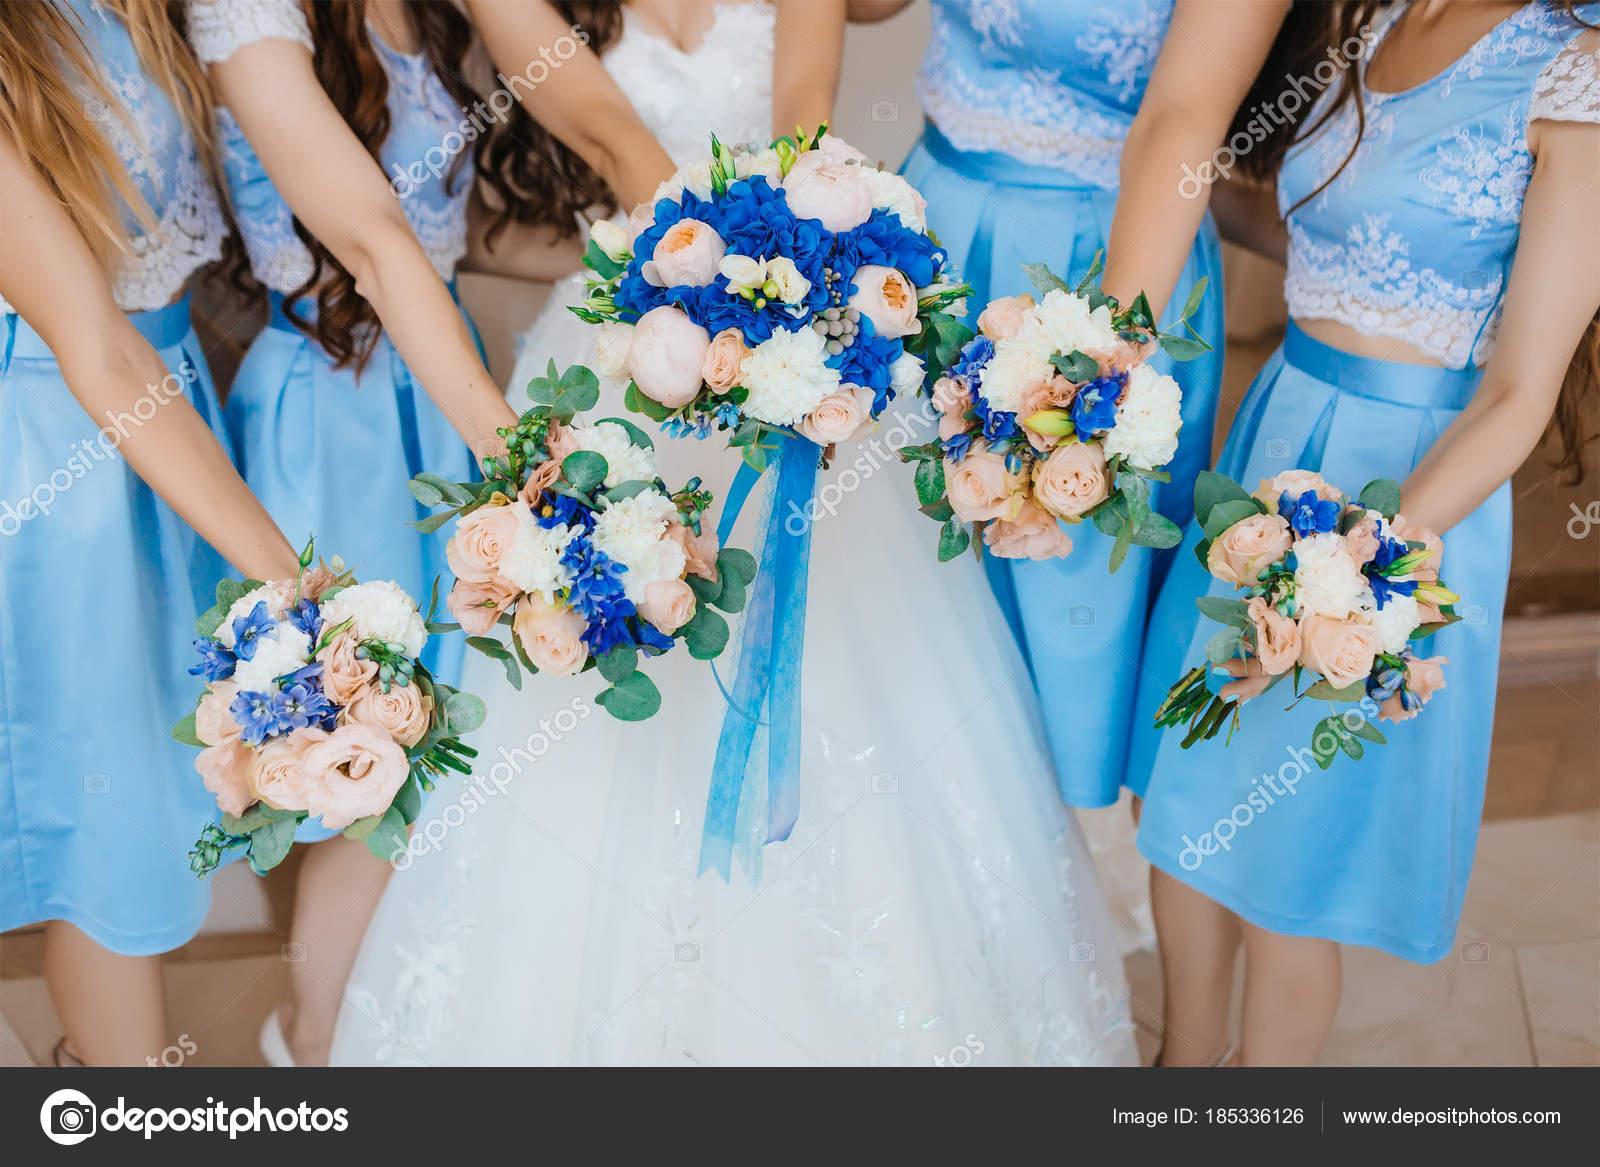 Turquoise Jurk Bruiloft.Mooie Bruidsmeisjes In Een Turquoise Jurken En Bruid Holding